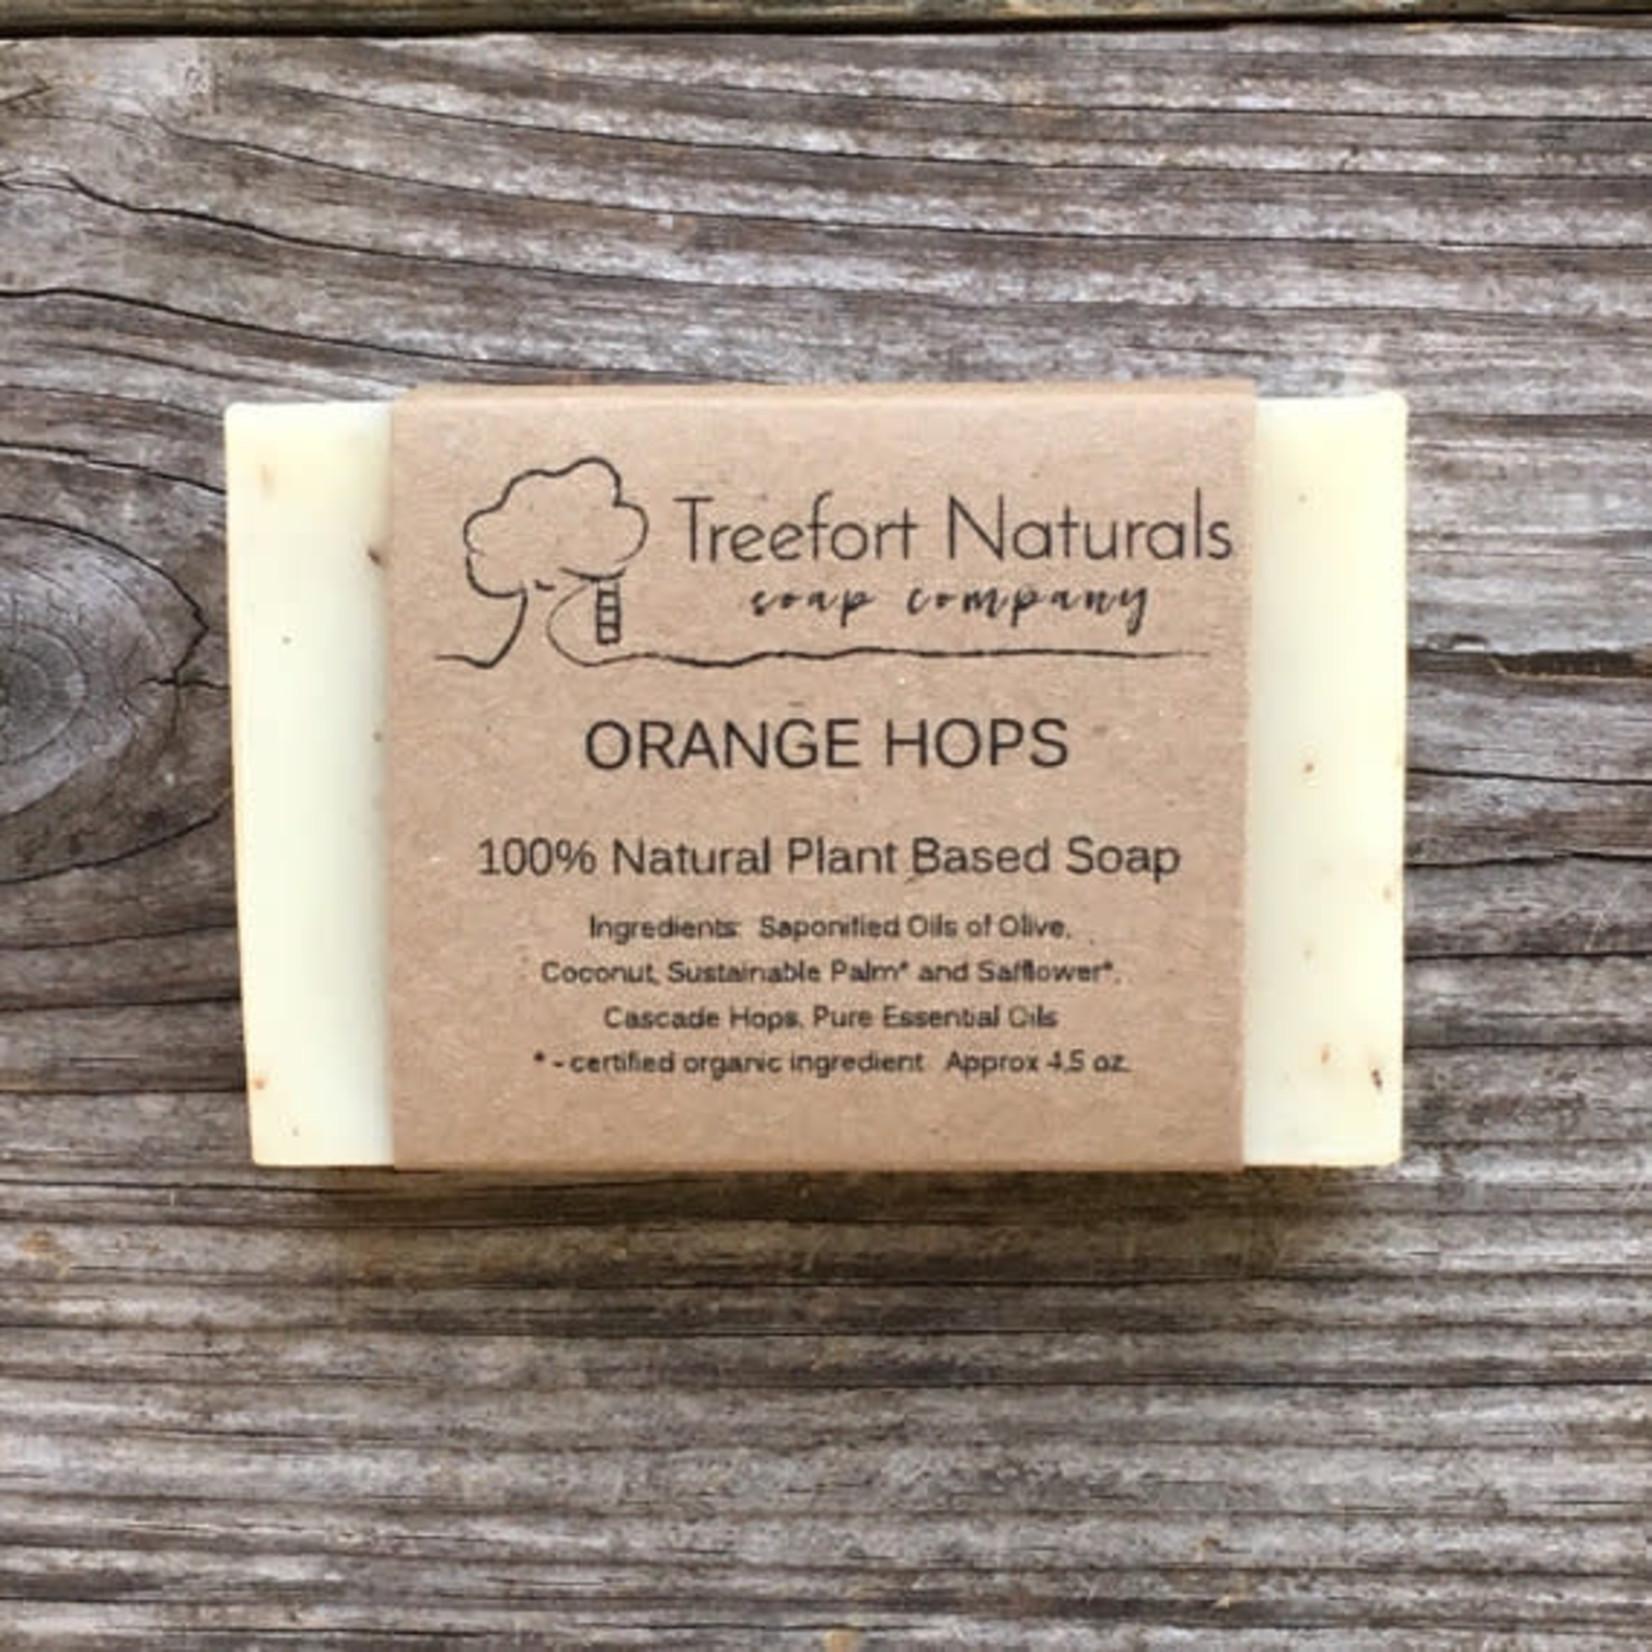 Treefort Naturals Treefort Naturals Orange Hops Soap